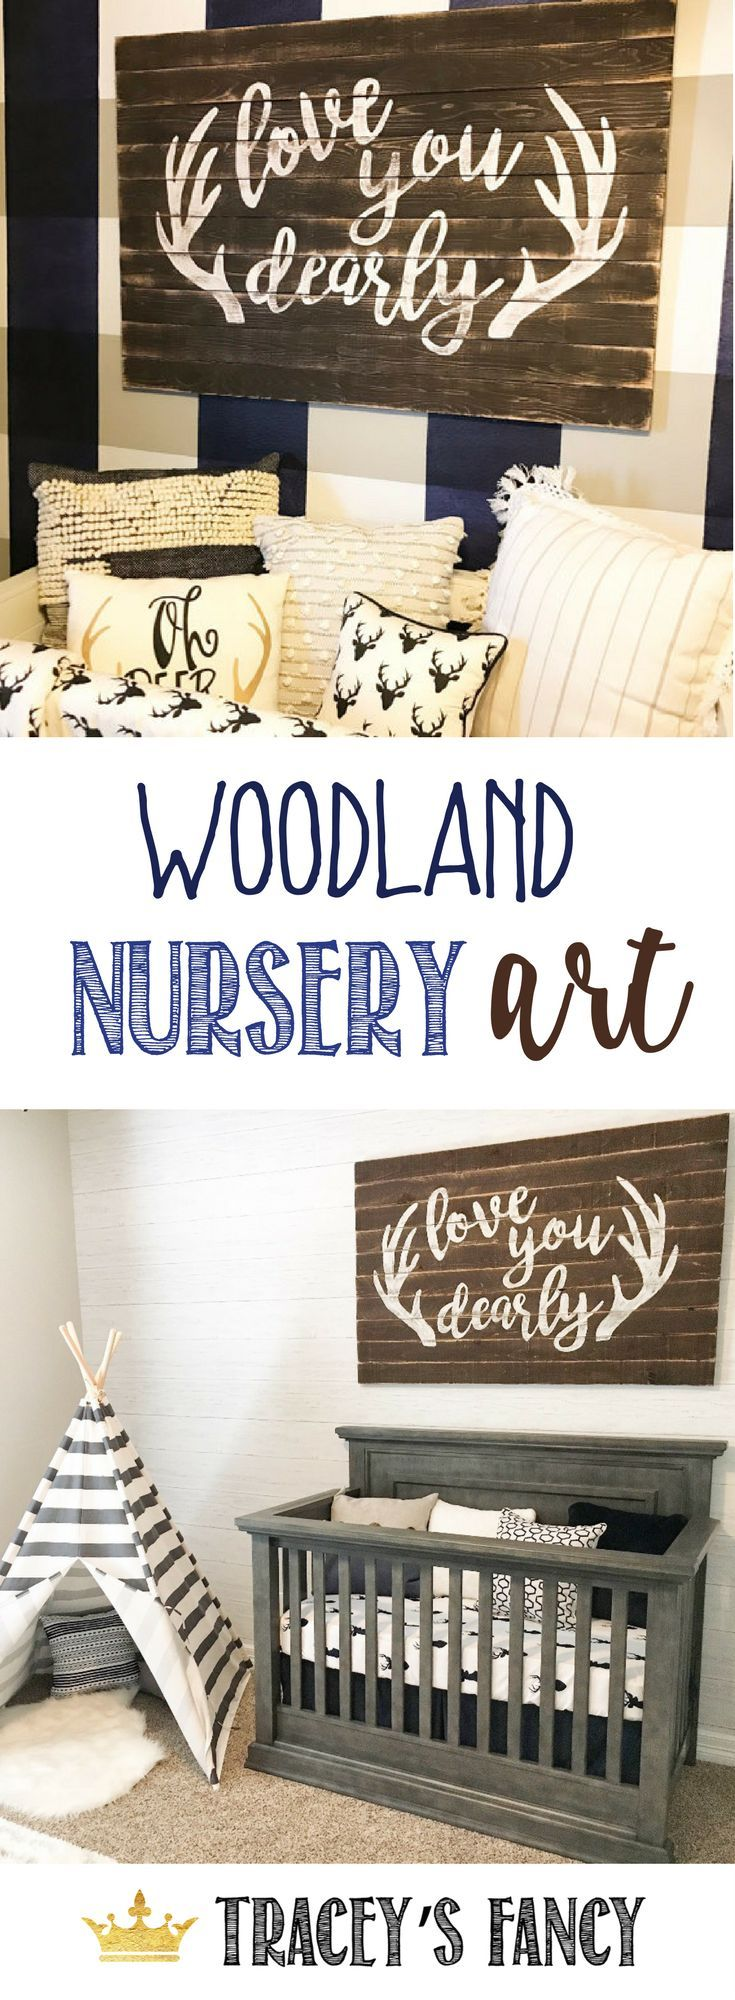 Love you Dearly - Plank Wall art for a Woodland-themed Nursery by Tracey's Fancy - Woodland Decor Ideas | Boys Nursery Ideas | Nursery Art | Boys Bedroom Ideas |